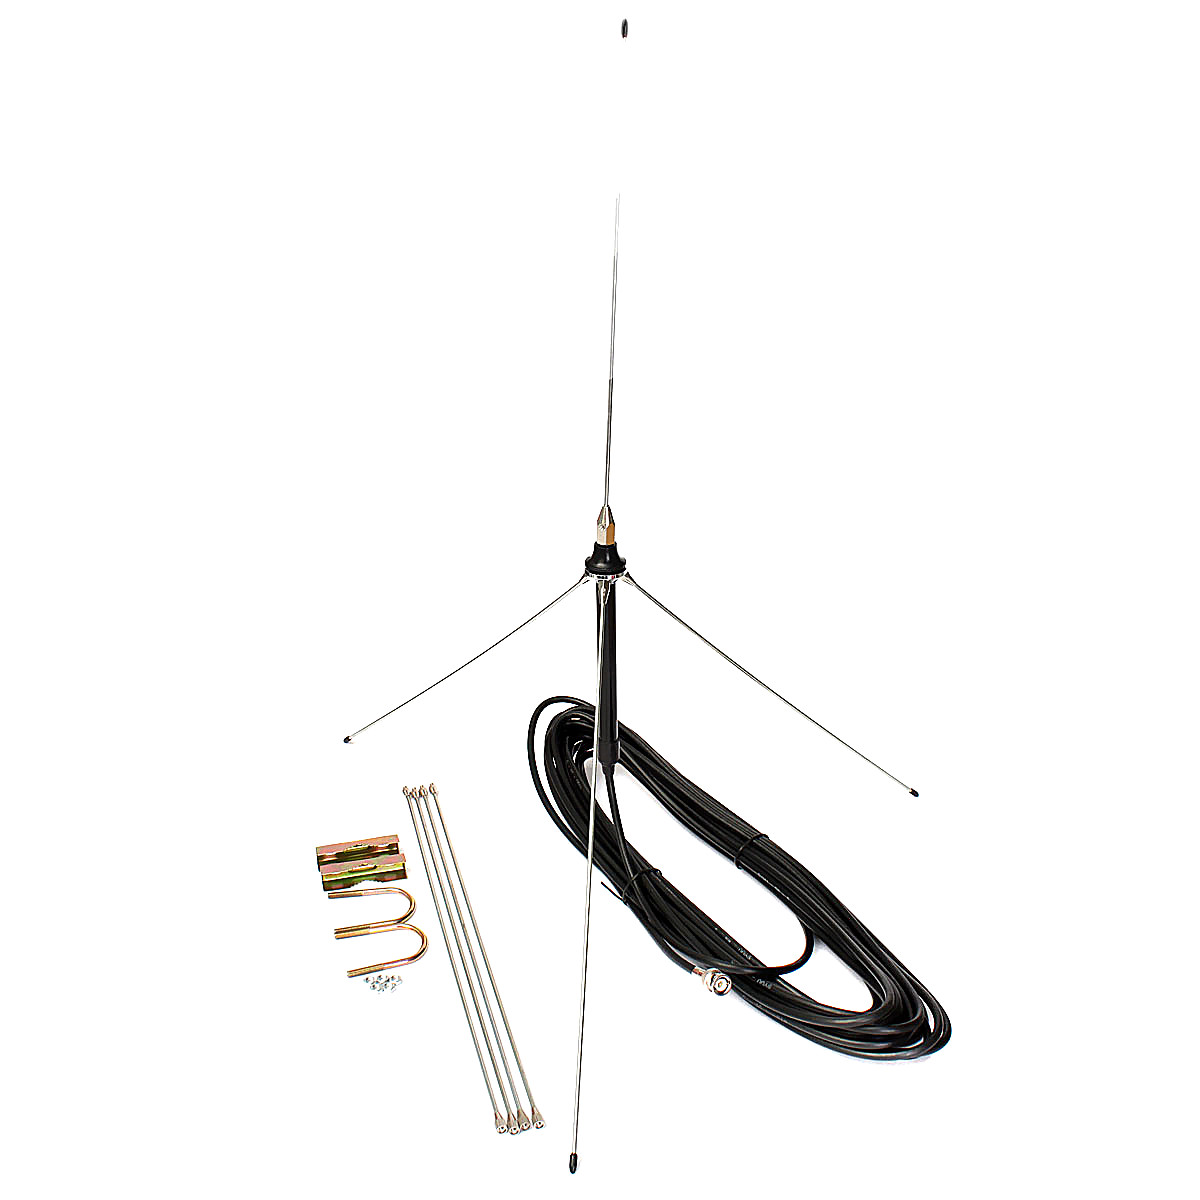 15 metros fuerte 1  4 de onda gp de antena bnc de 0 5 a 30